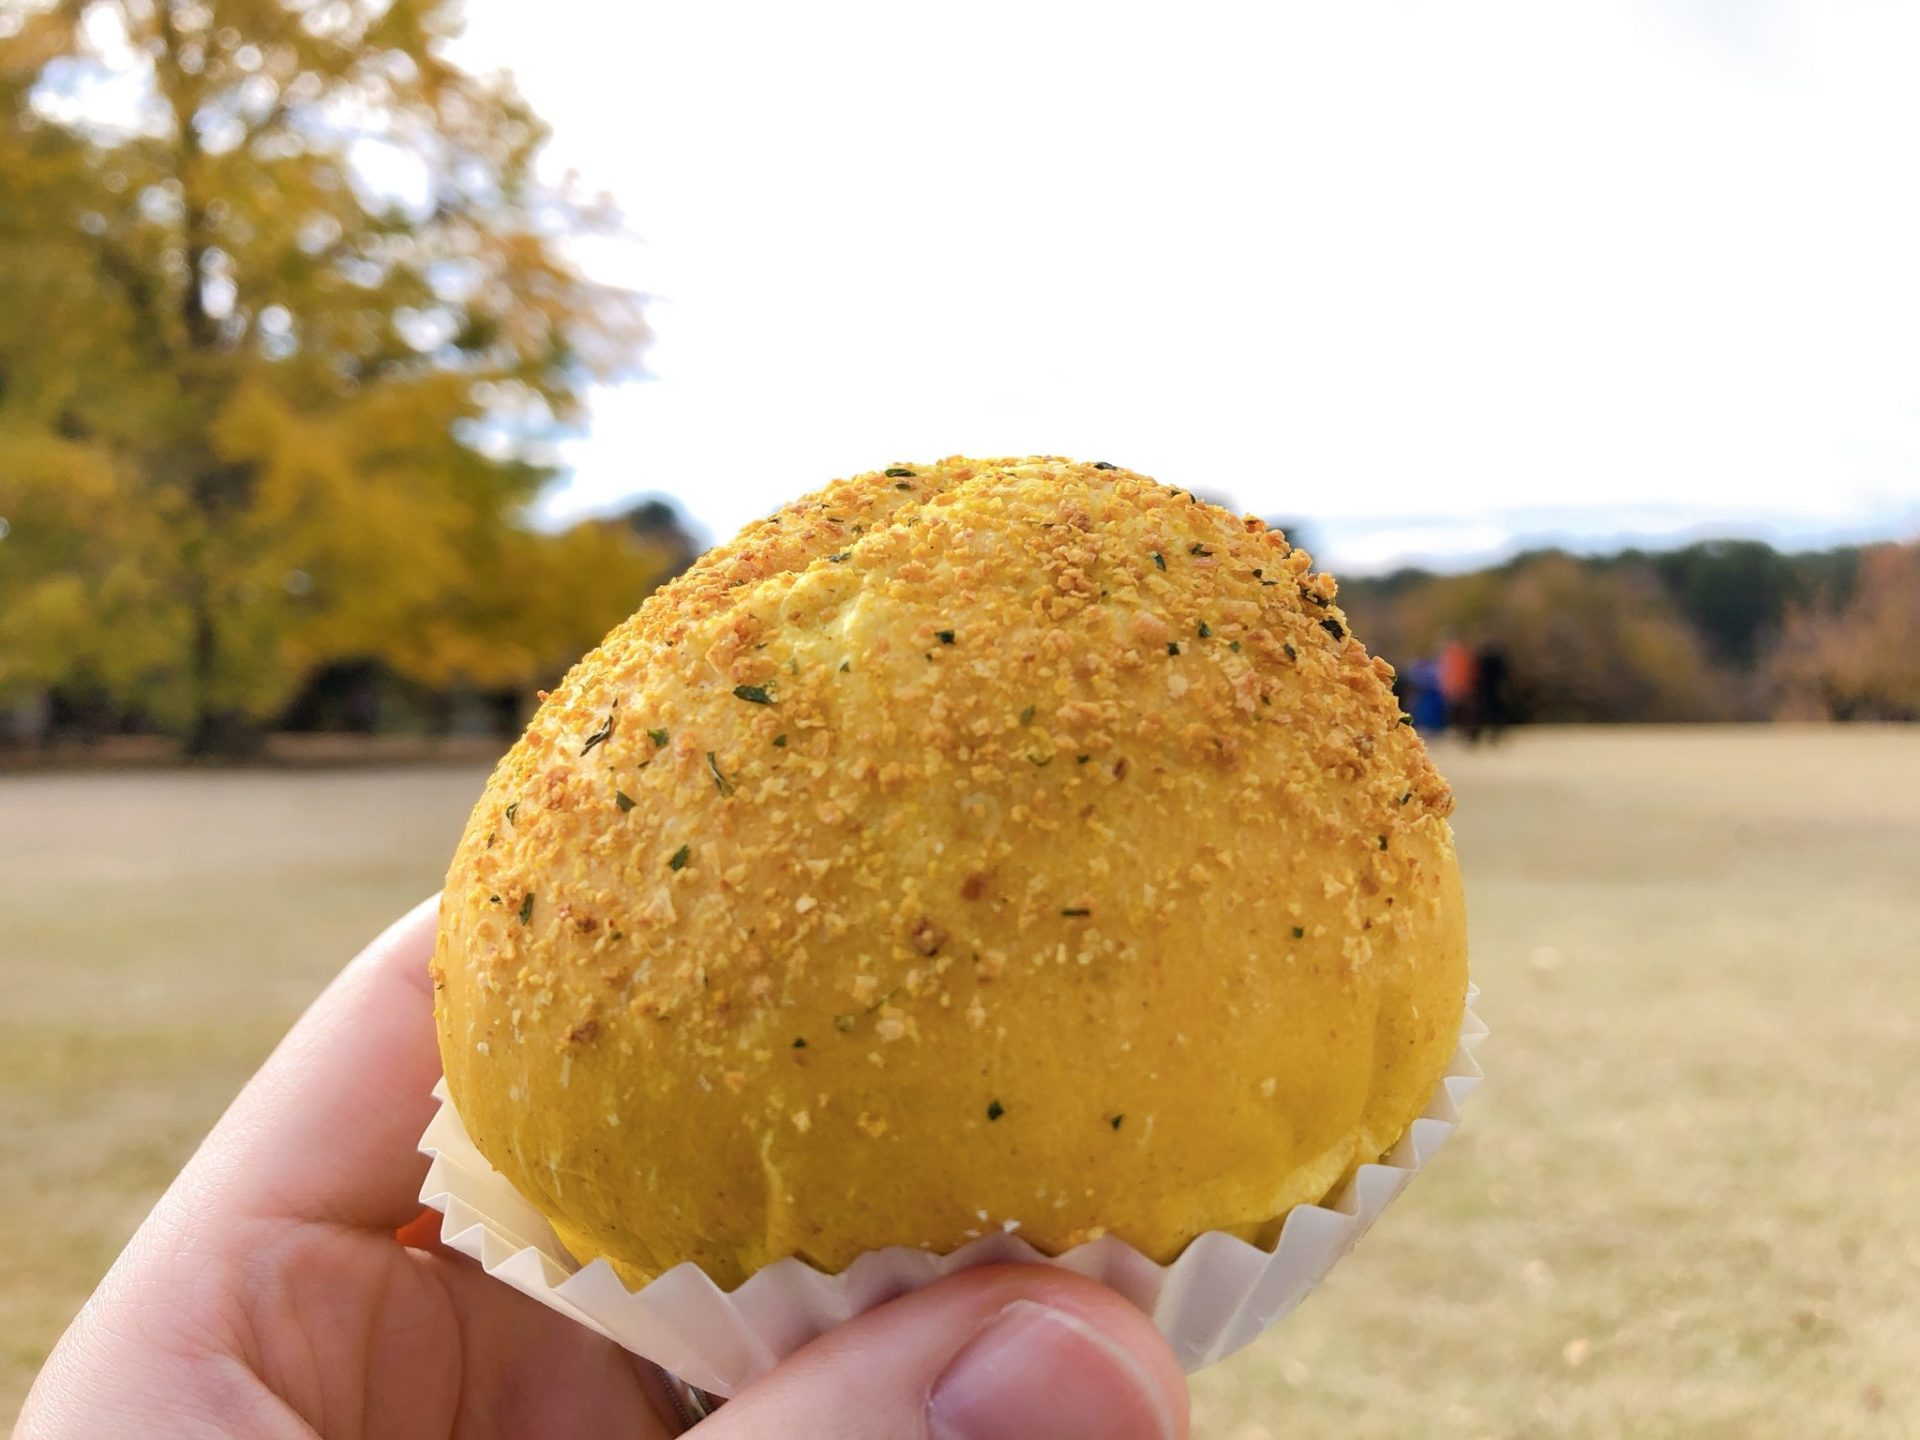 【BOUL'ANGE(ブールアンジュ)新宿】サザンテラス 焼きカレーパン